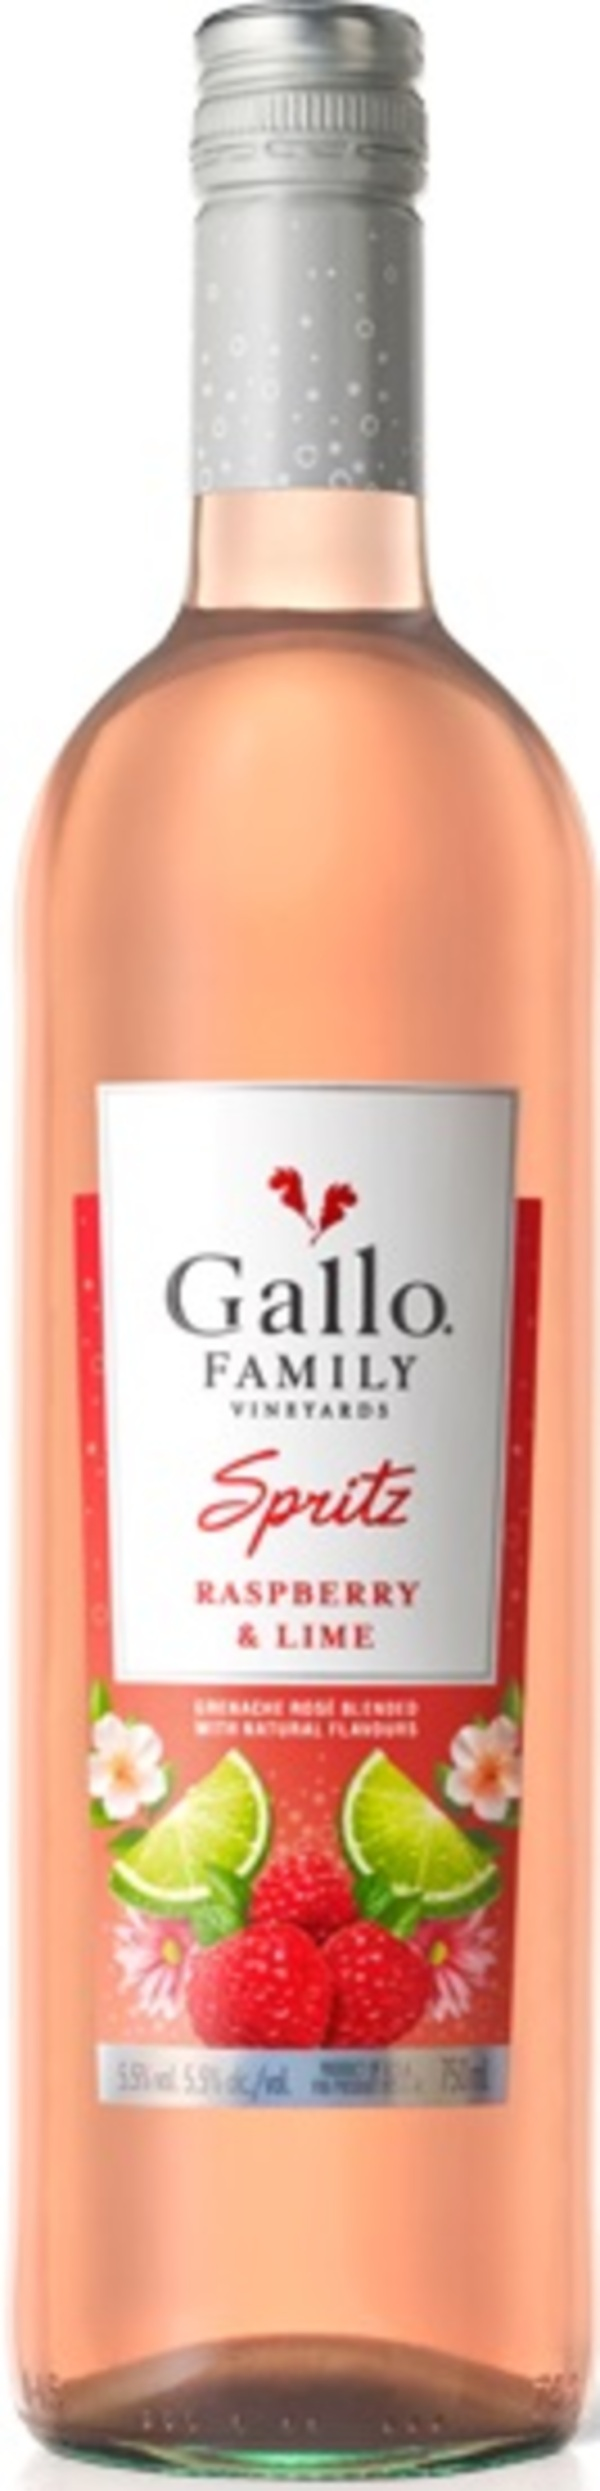 Gallo Family Spritz Raspberry & Lime 0,75 ltr